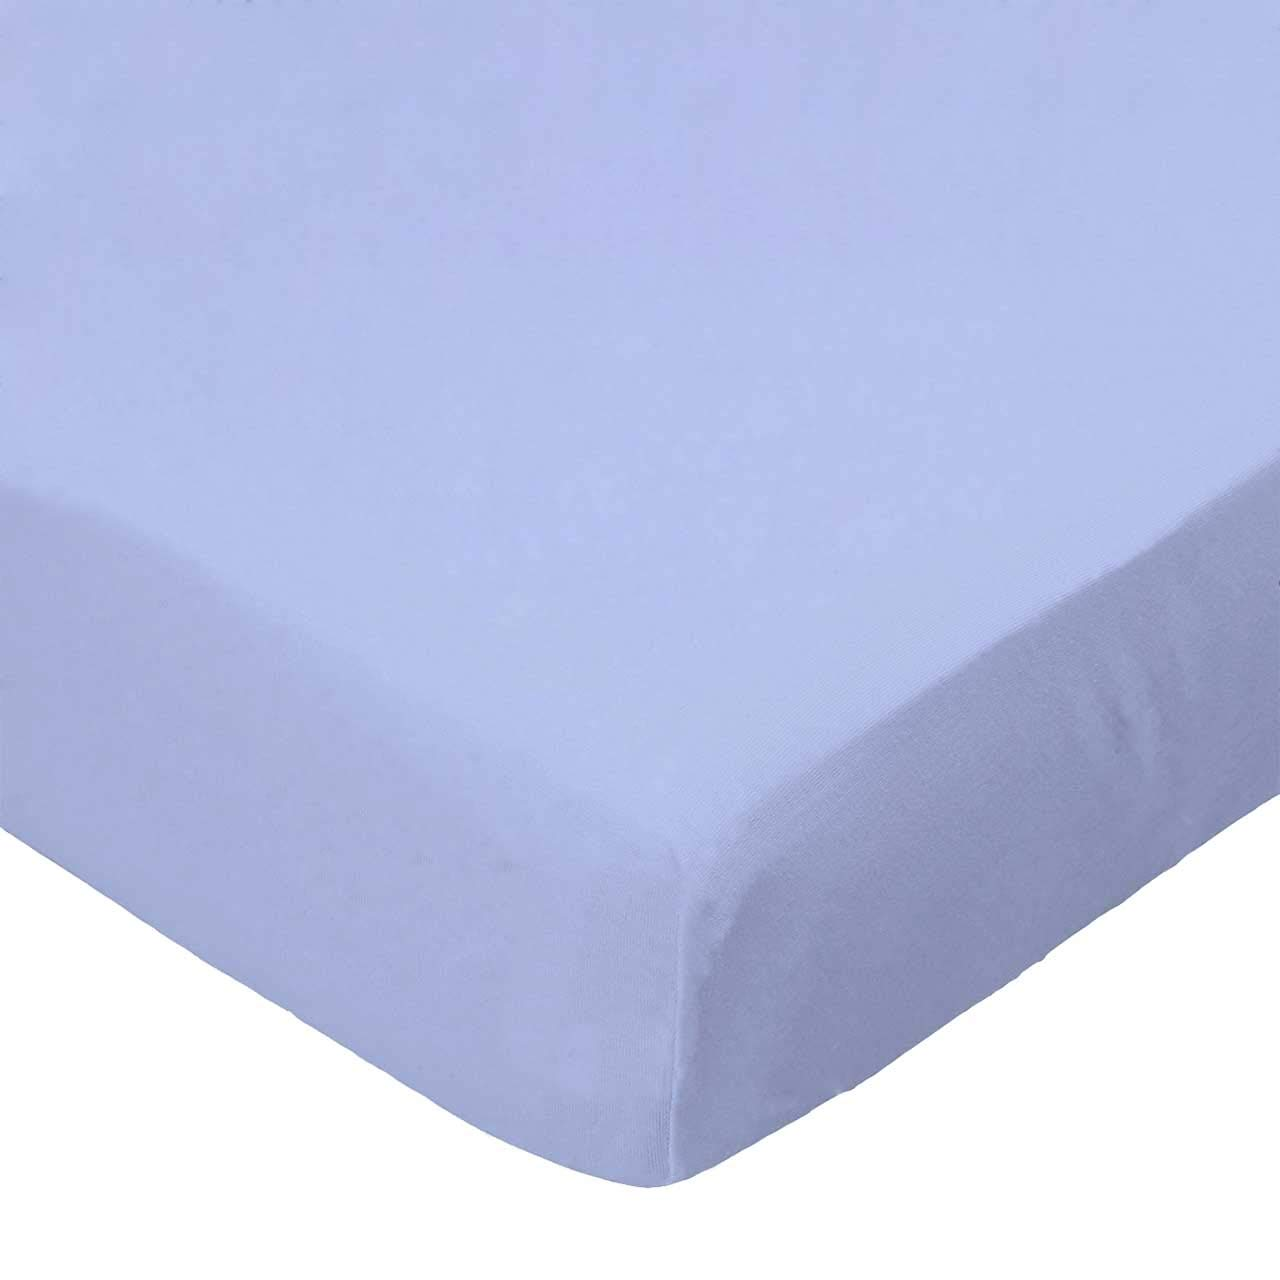 Dark Grey Woven Made In USA SheetWorld Fitted Portable Mini Crib Sheet